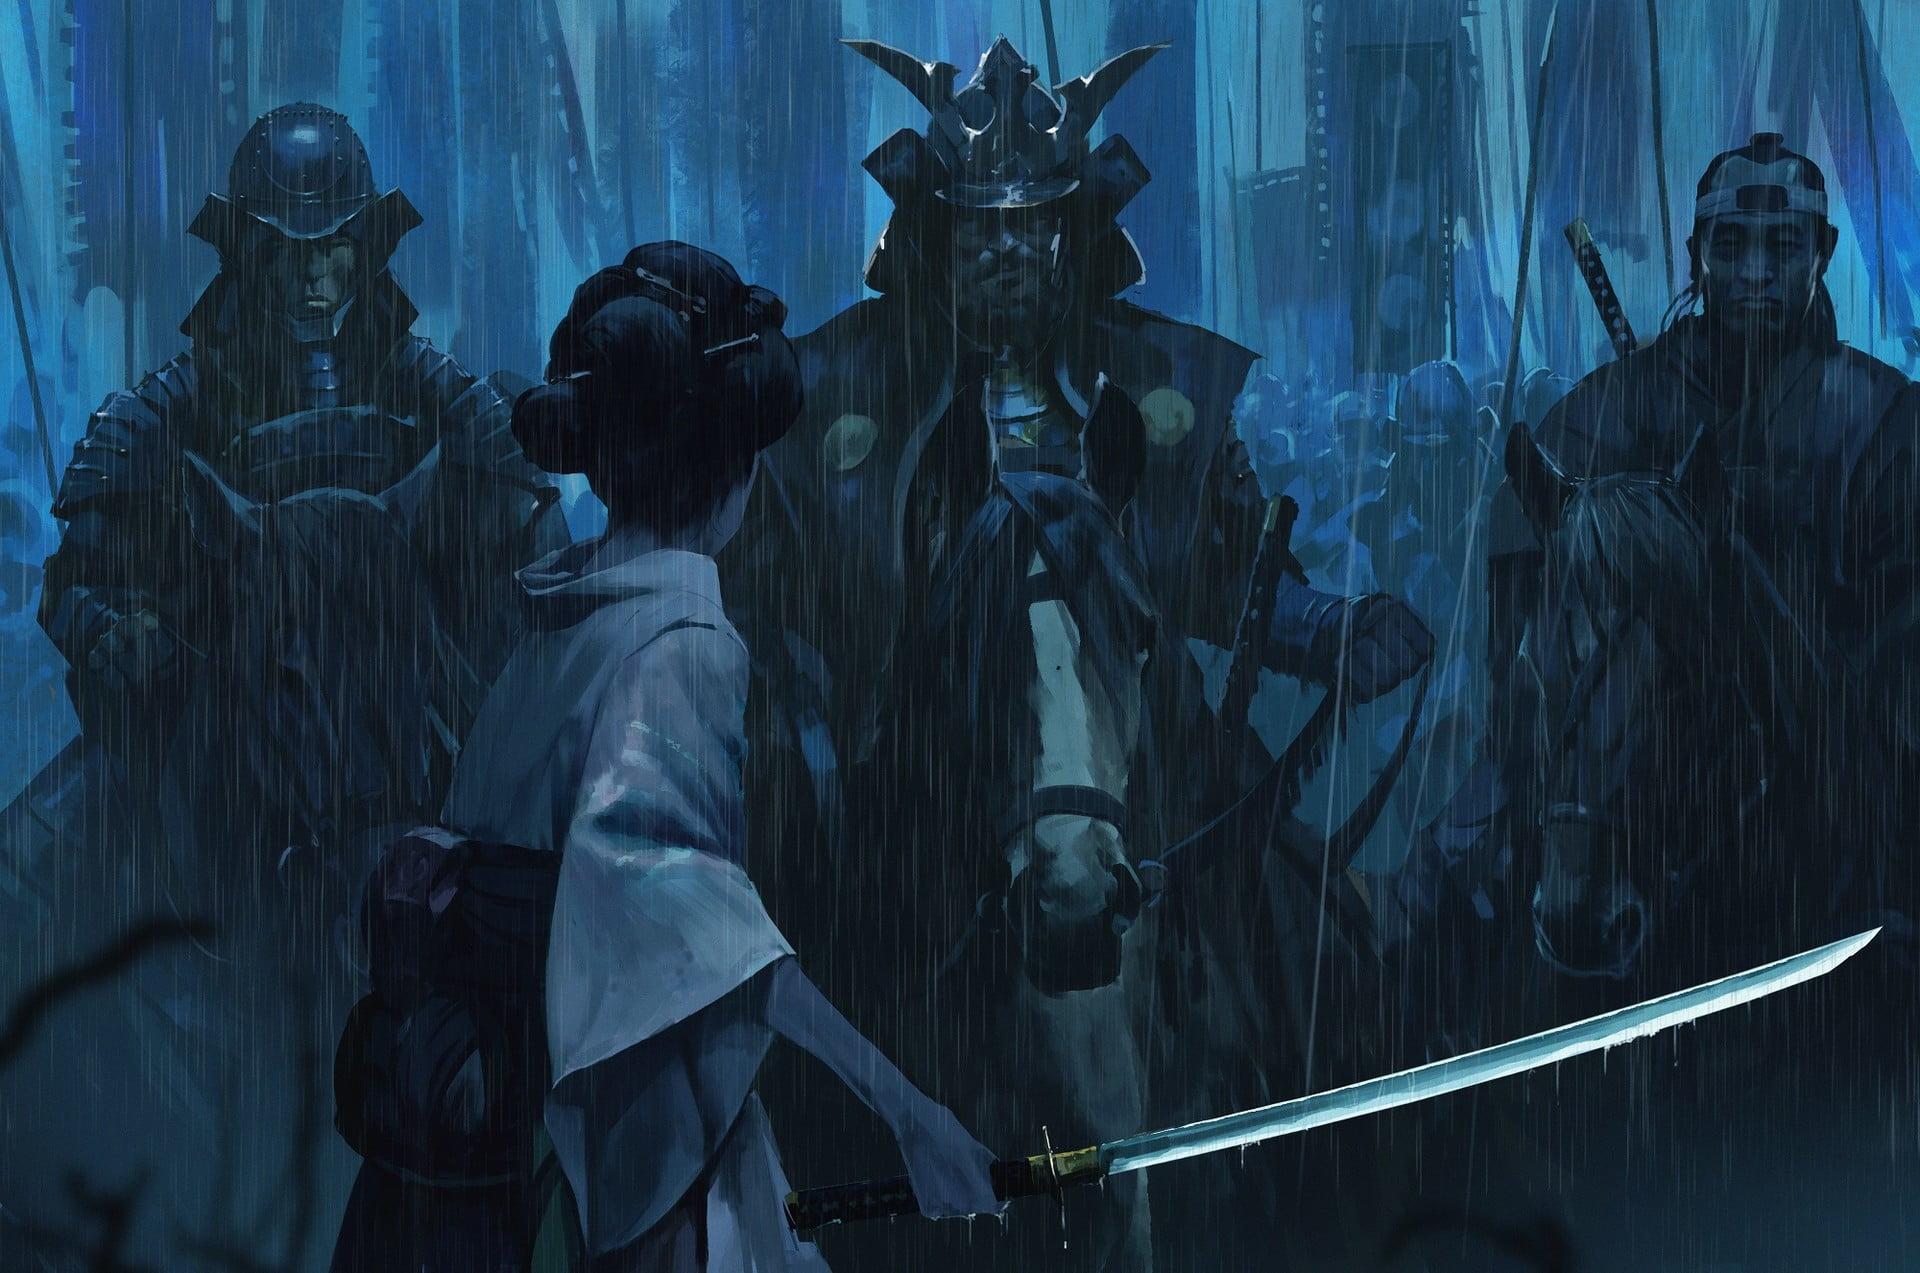 Samurai Wallpaper 4k Posted By John Tremblay